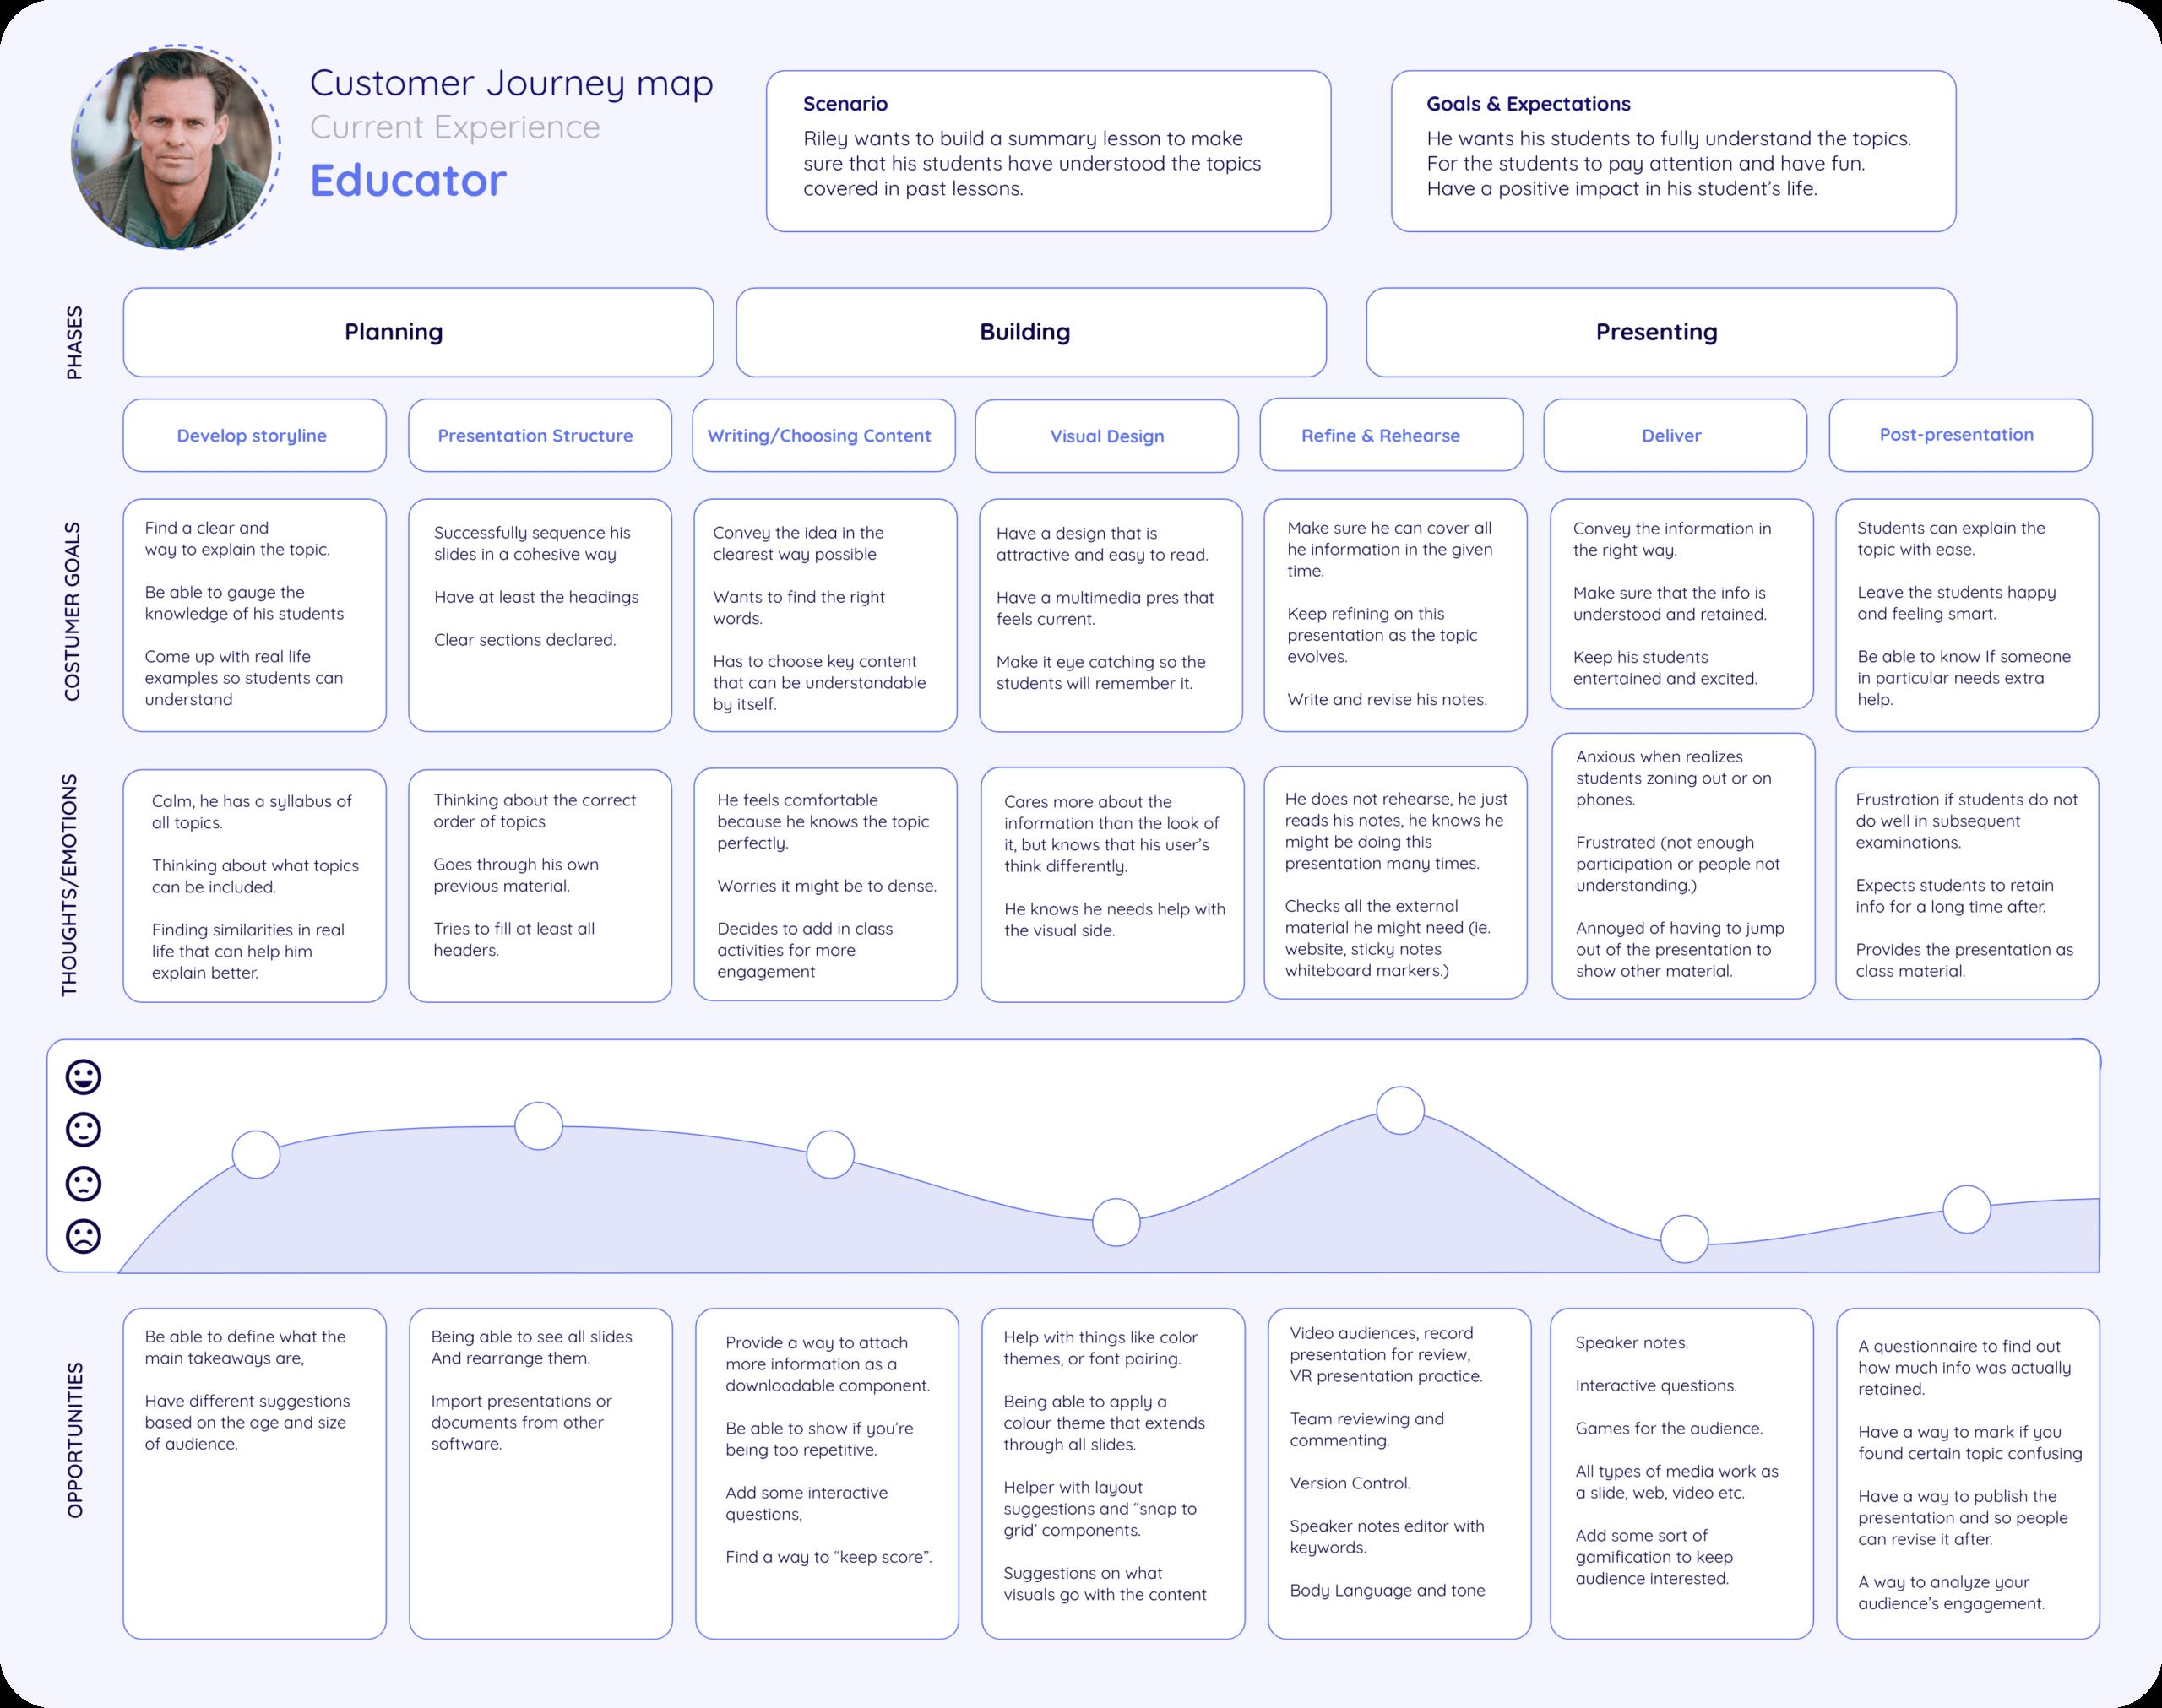 Customer Journey Map: Educator